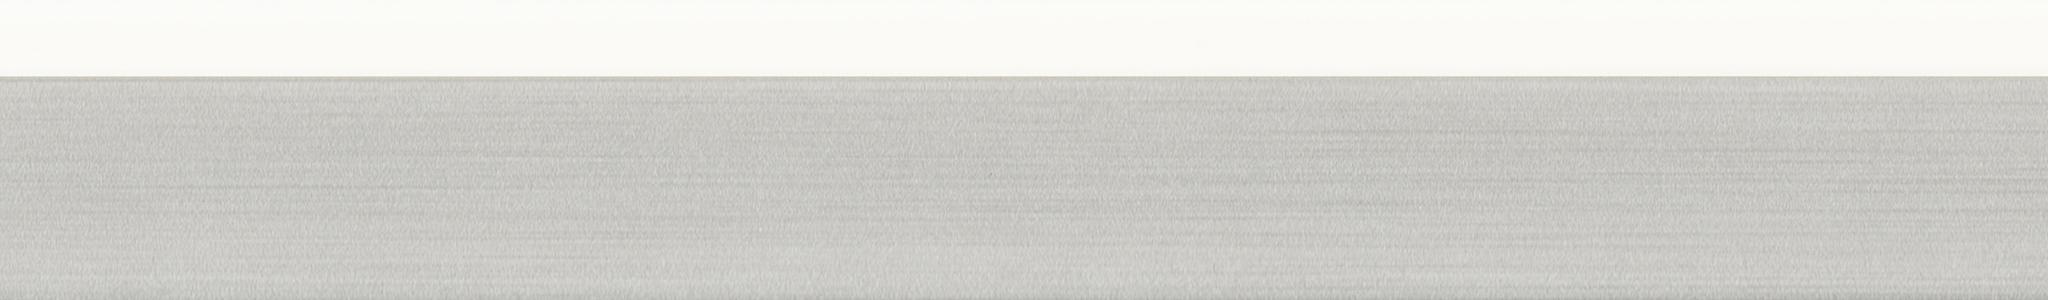 HD 29198 Acryl 3D Kante 2in1 Stahl-Weiß